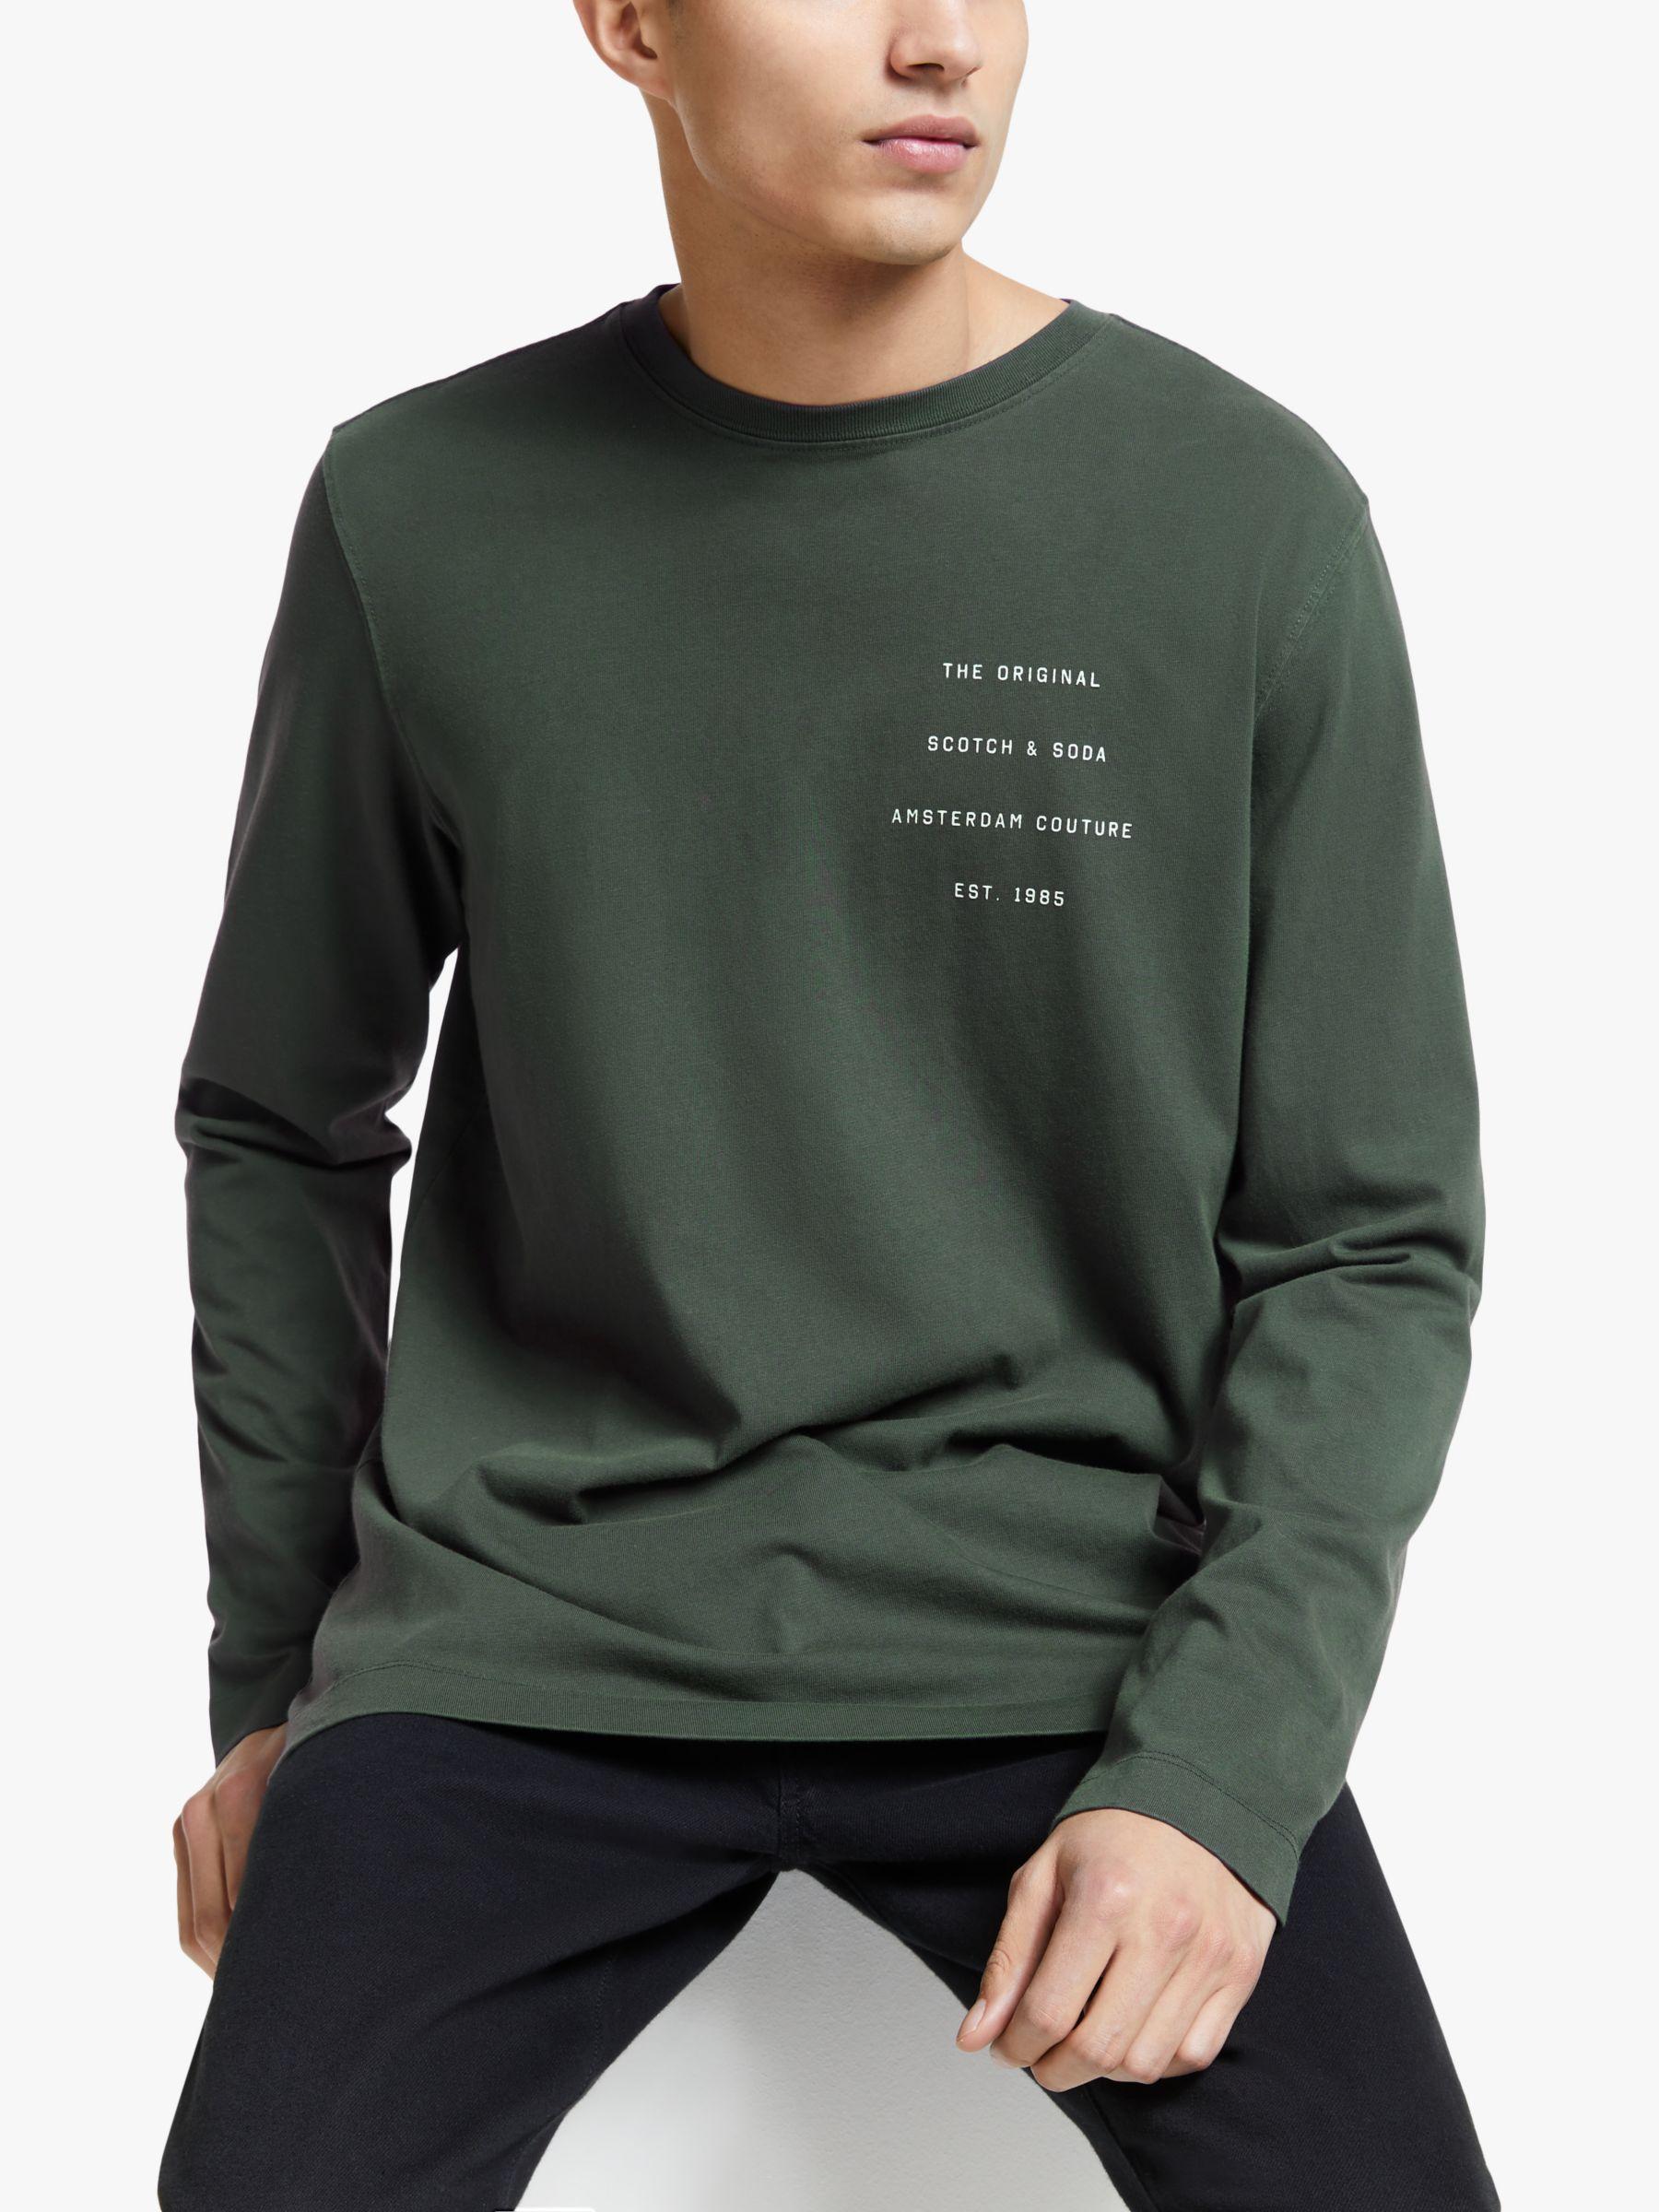 Scotch & Soda Scotch & Soda Logo Detail Organic Cotton Long Sleeve T-Shirt, Army